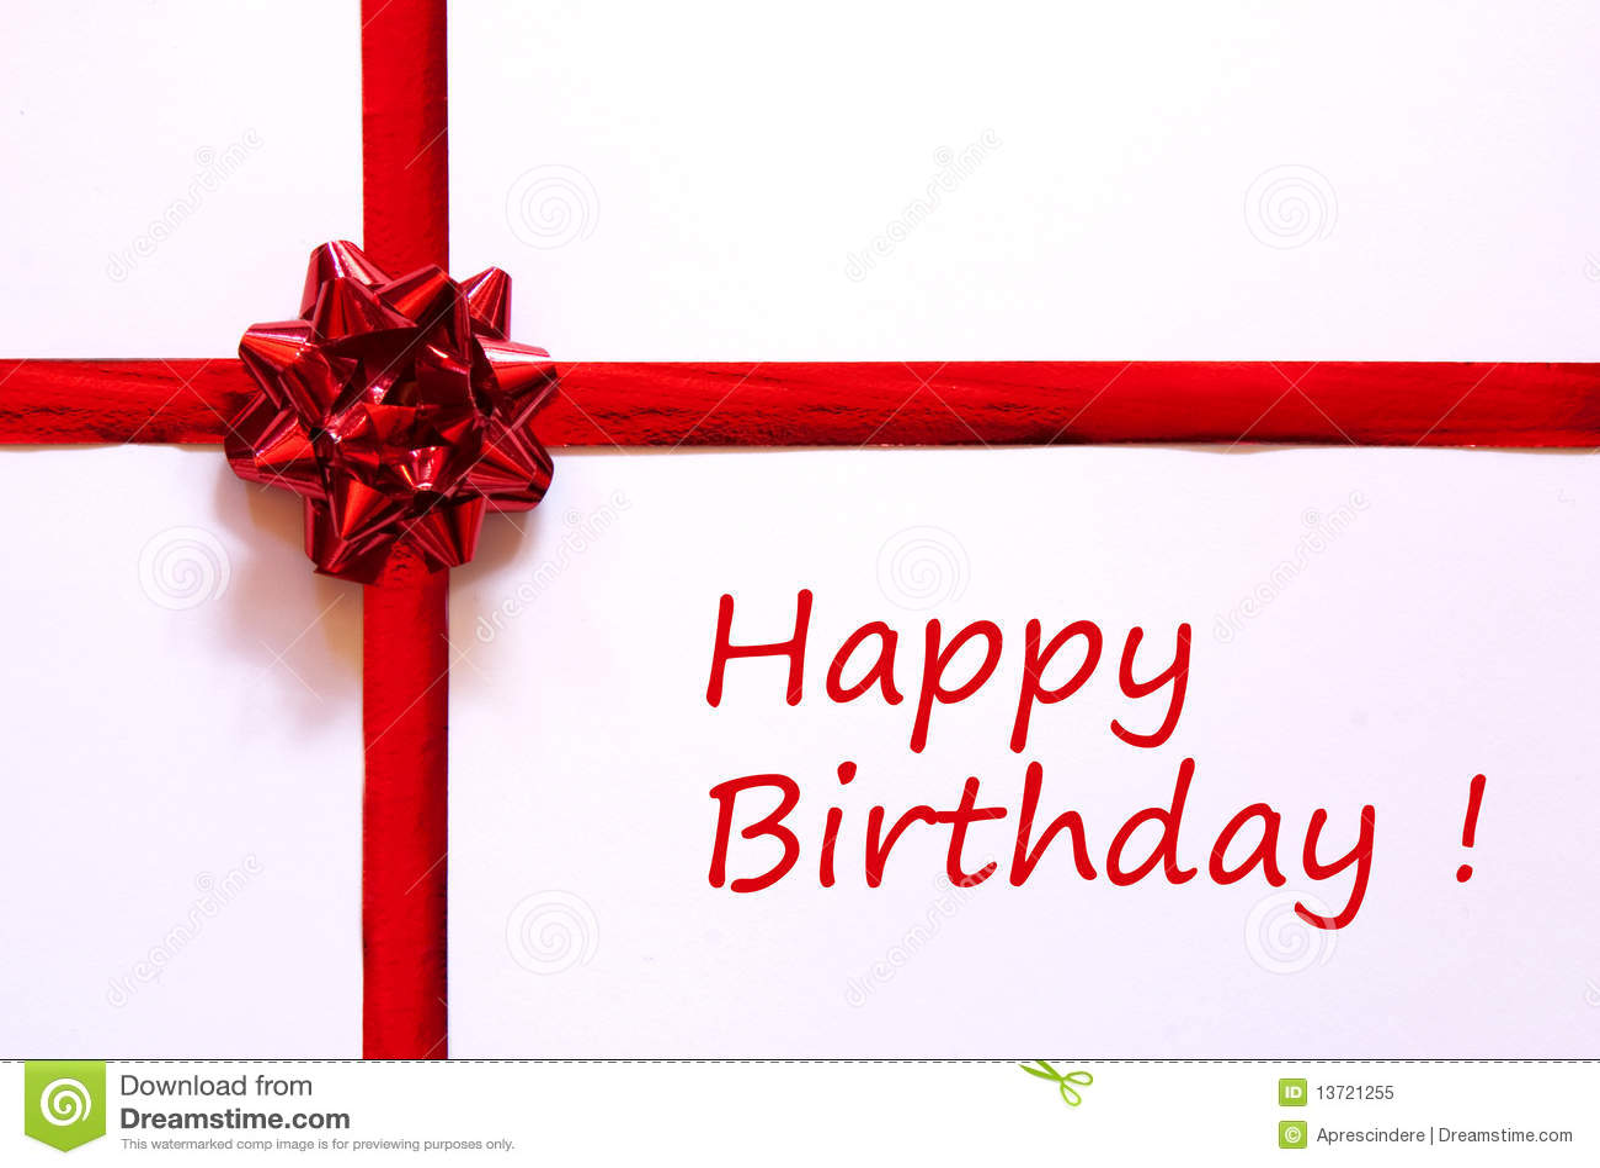 happy birthday card for - photo #39